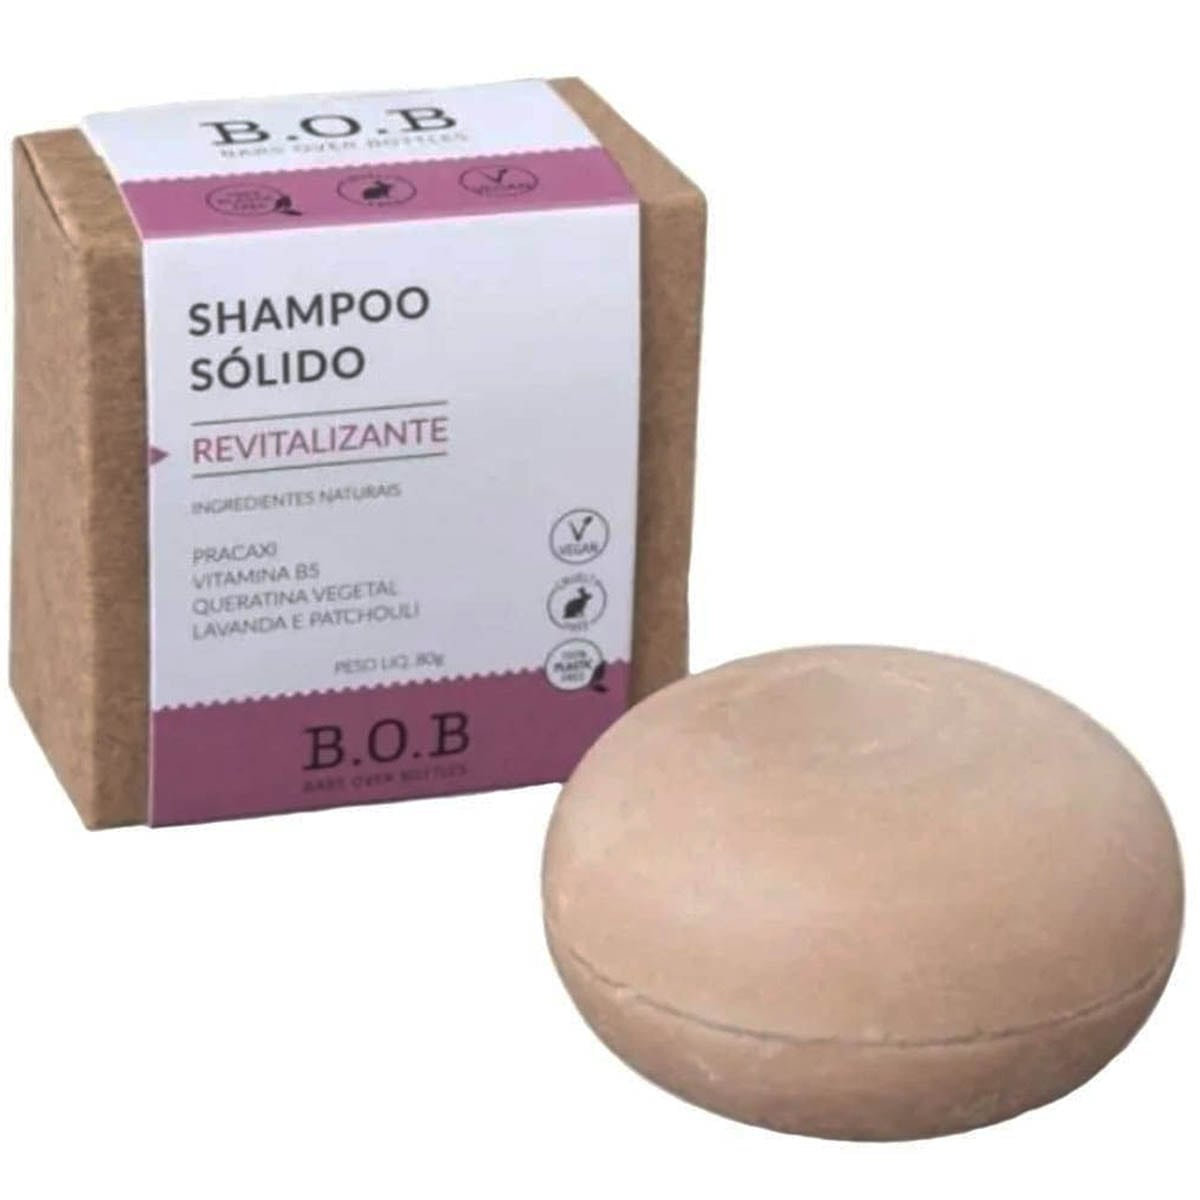 Shampoo solido revitalizante 75g - B.O.B